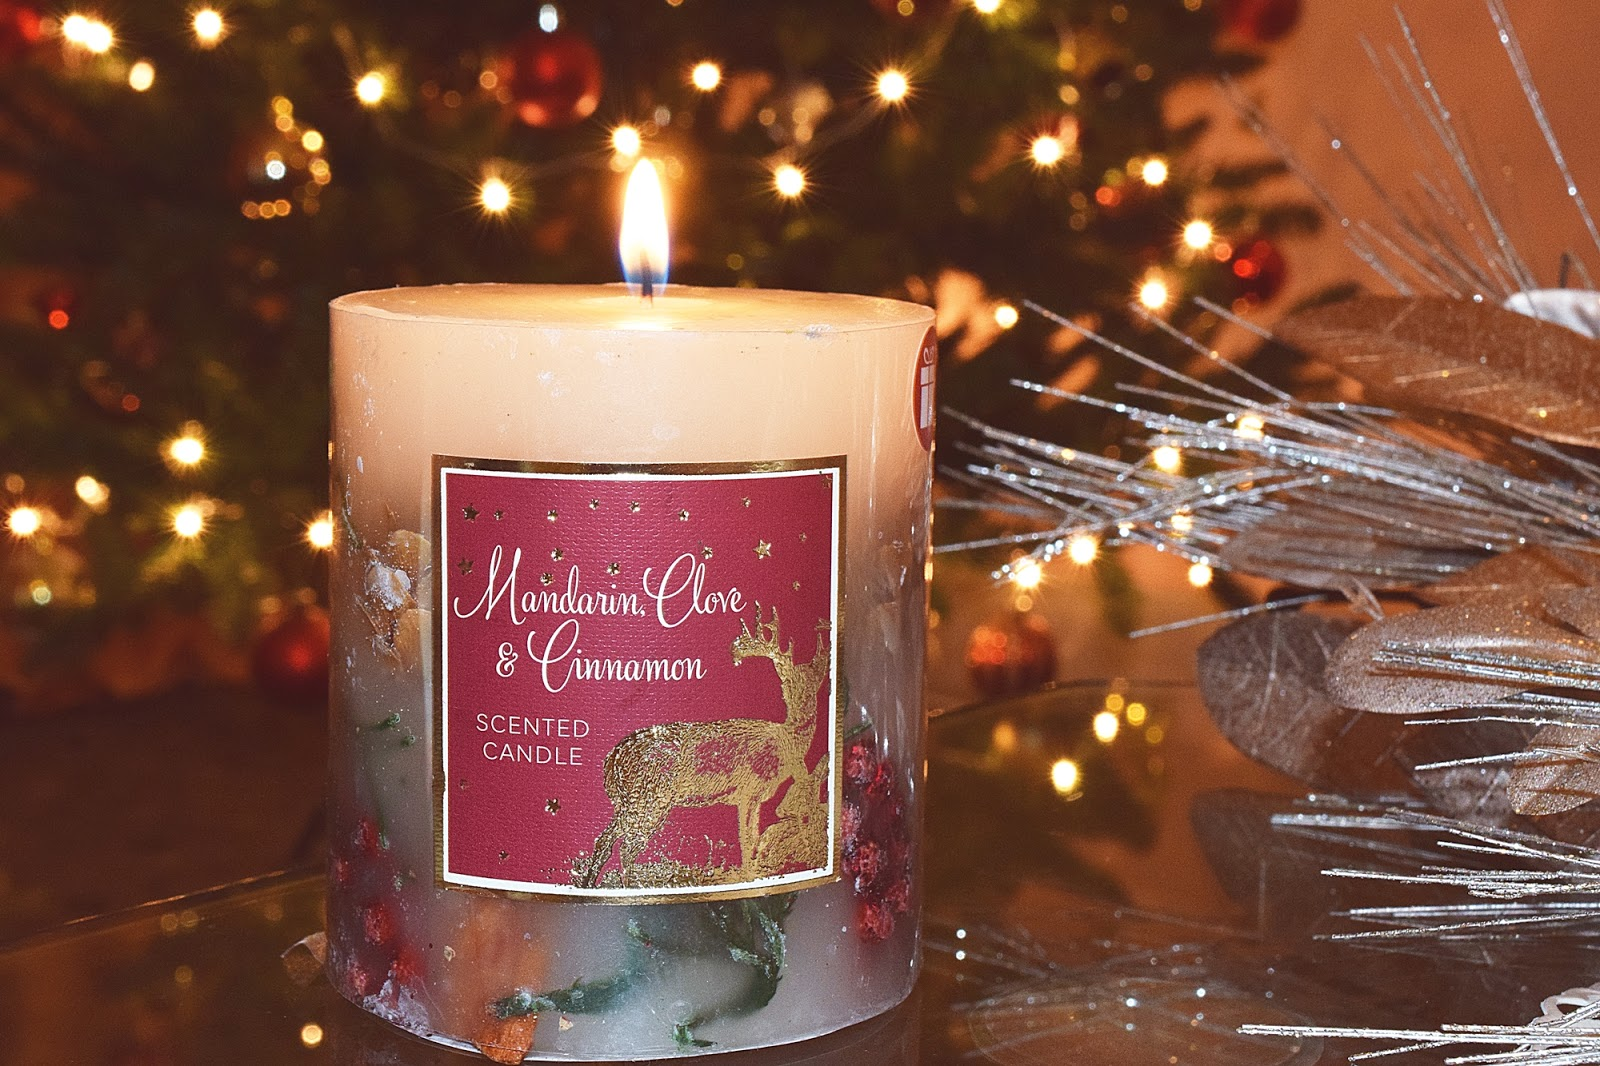 Mandarin, Clove & Cinnamon Scented Candle